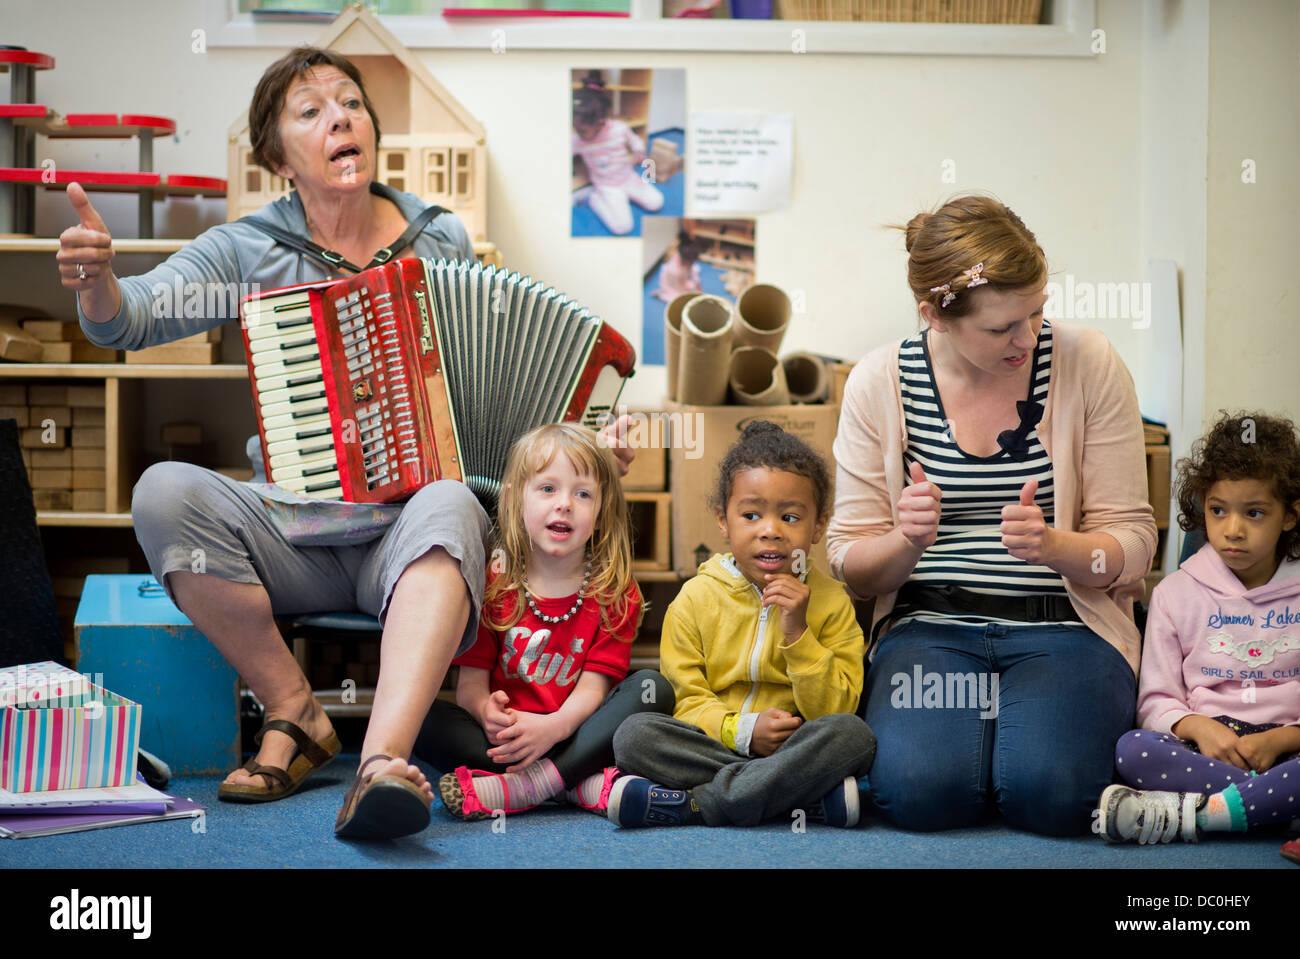 St. Pauls Nursery School and Children's Centre, Bristol UK 2013 - A music class. - Stock Image